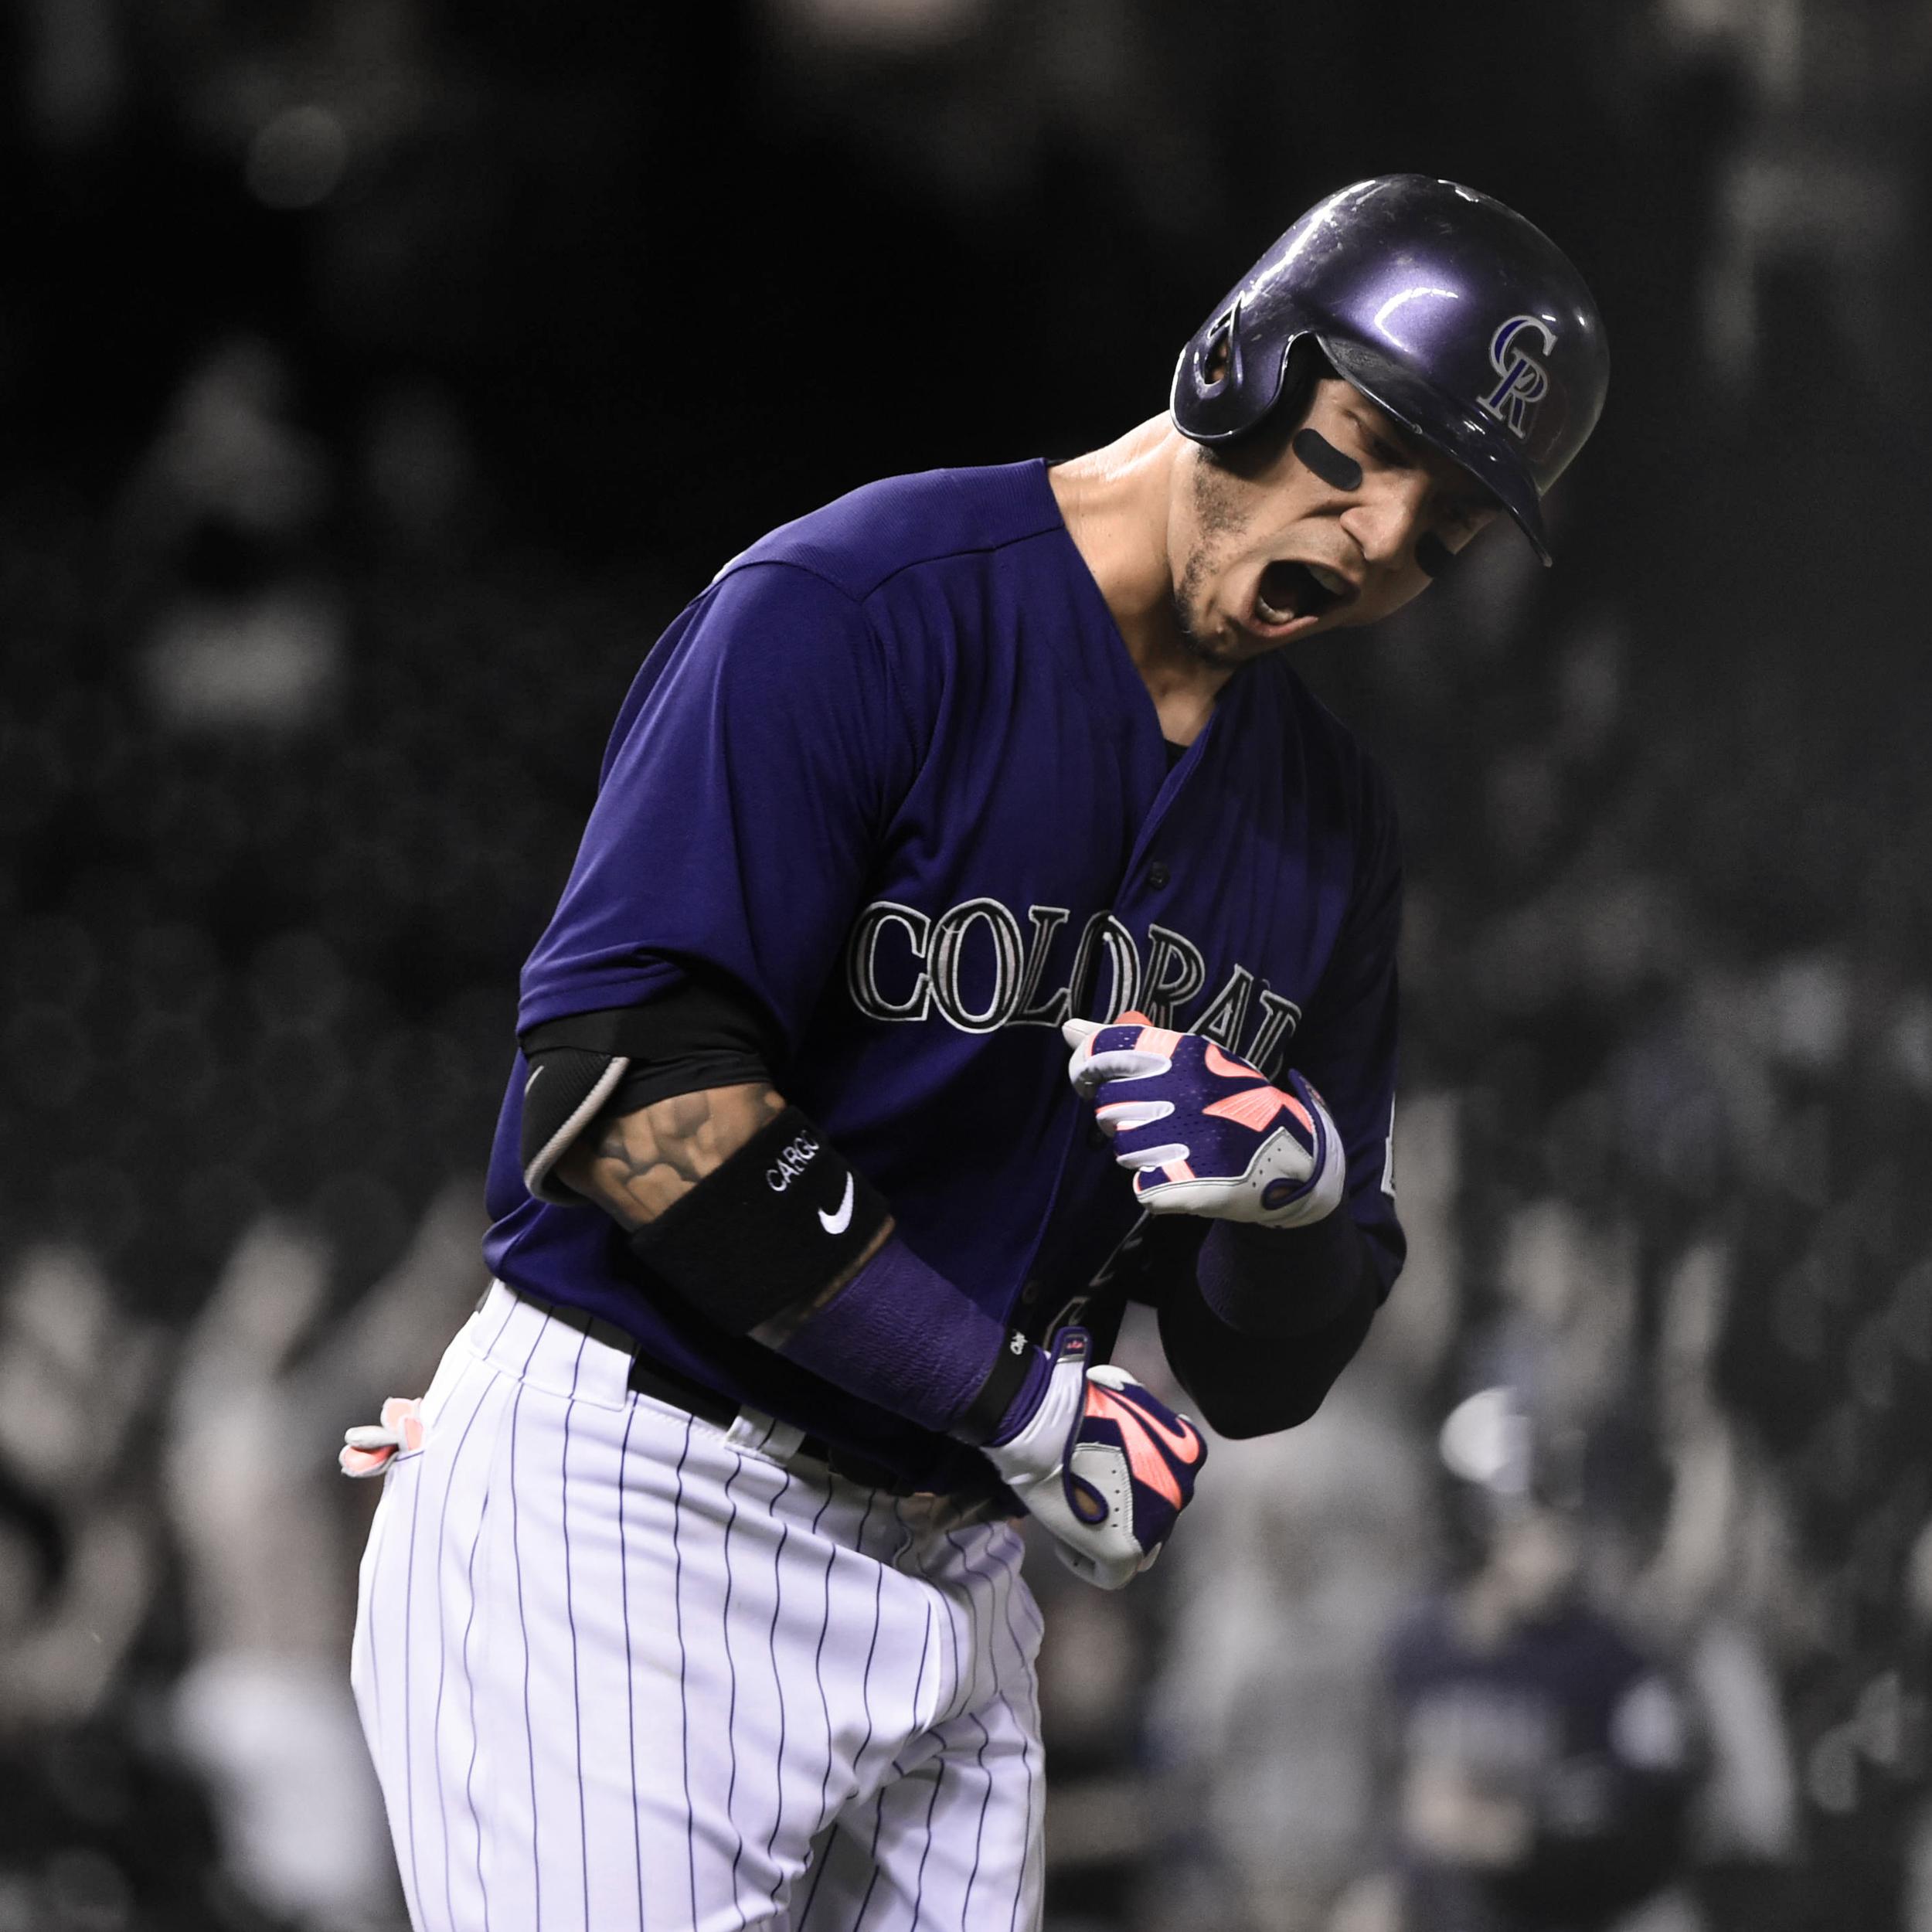 Rockies' outfielder Carlos Gonzalez celebrates after hitting a clutch grand-slam homerun